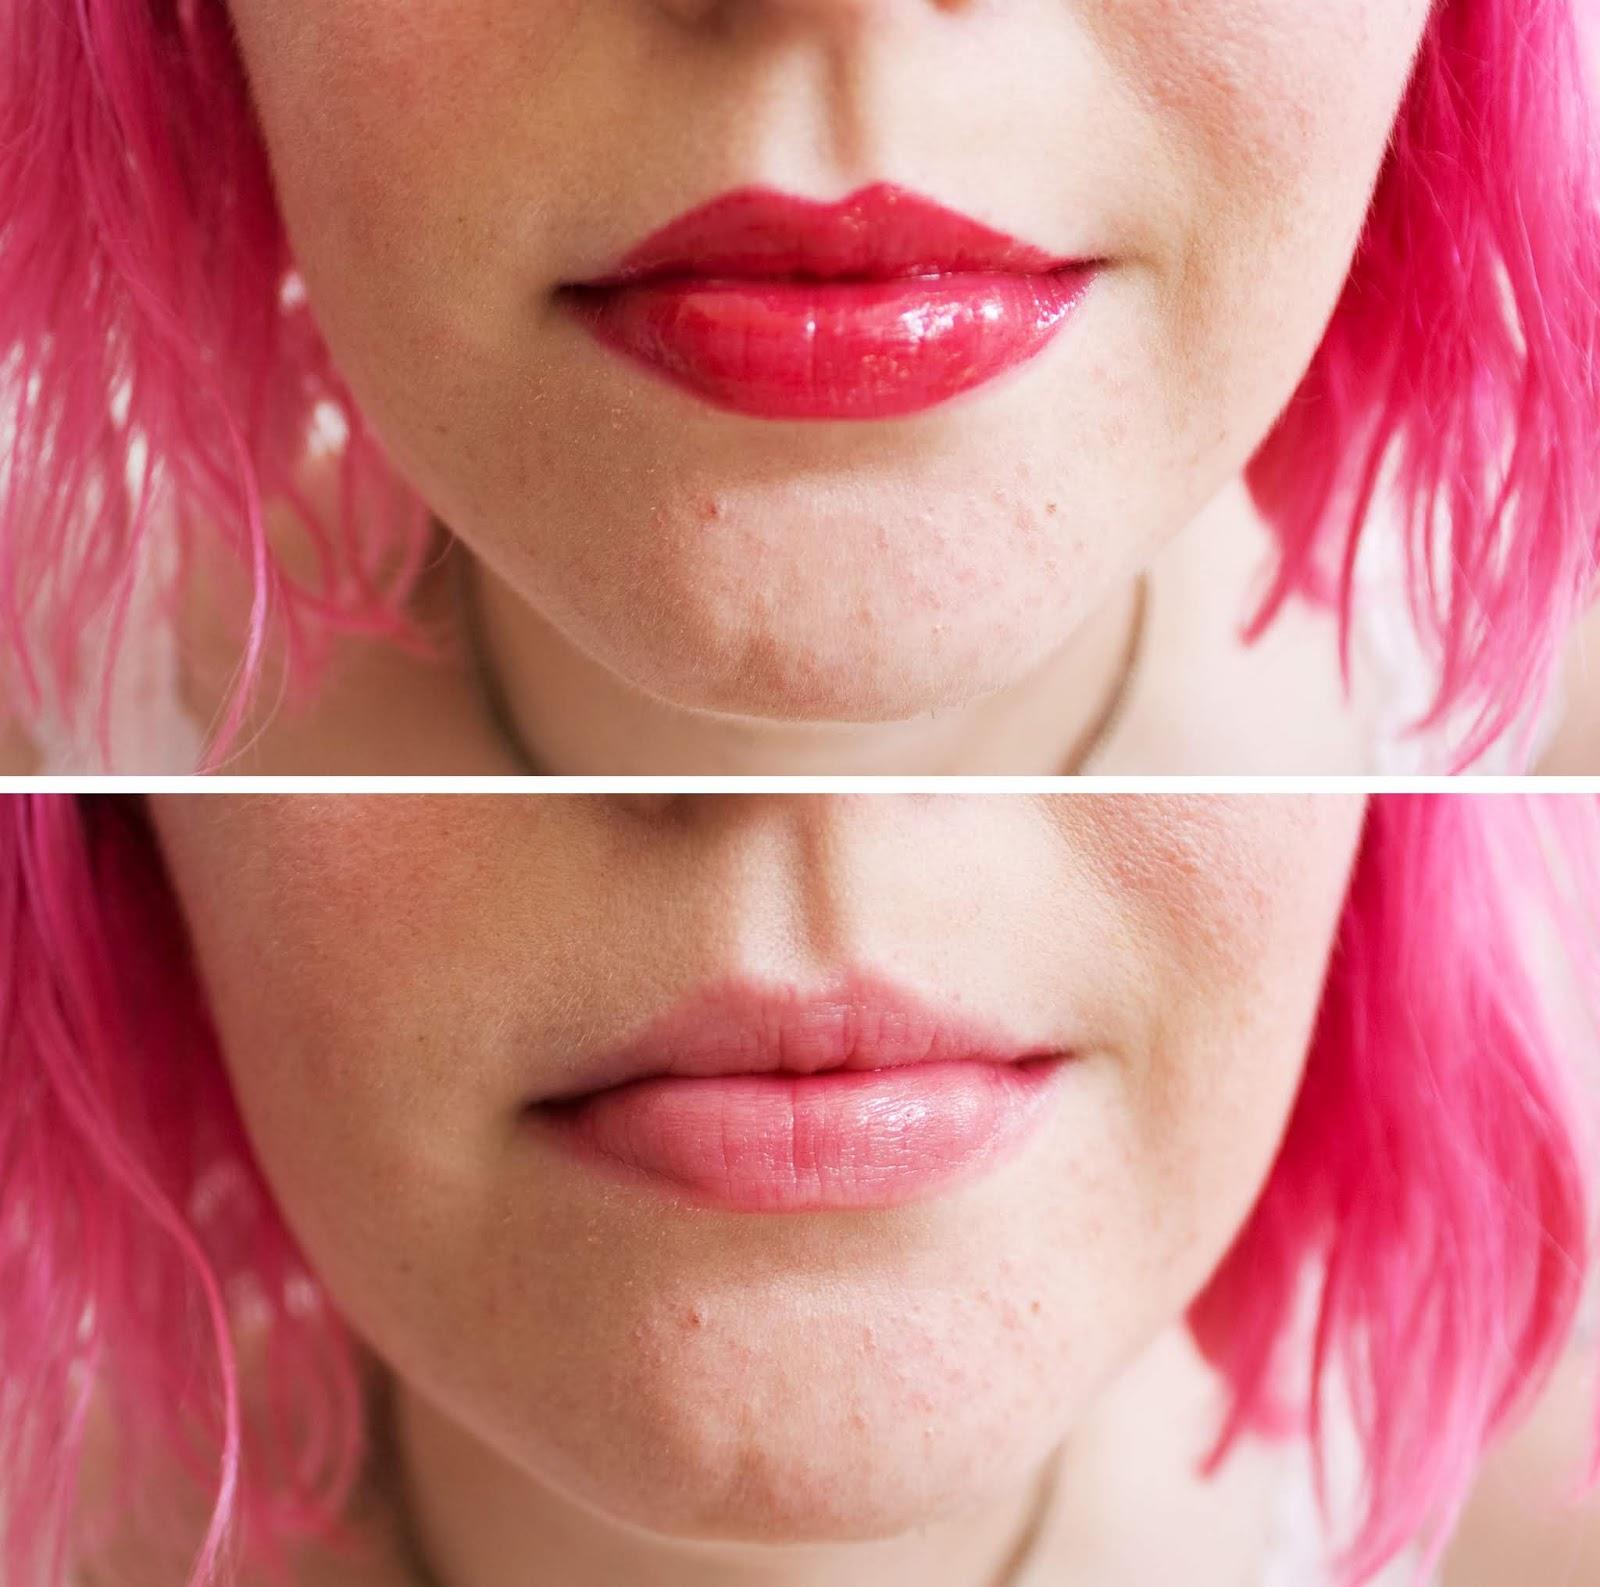 d7a2808415 LimeCrime Wet Cherry Gloss Review - A Nostalgic Necessity or Nah ...